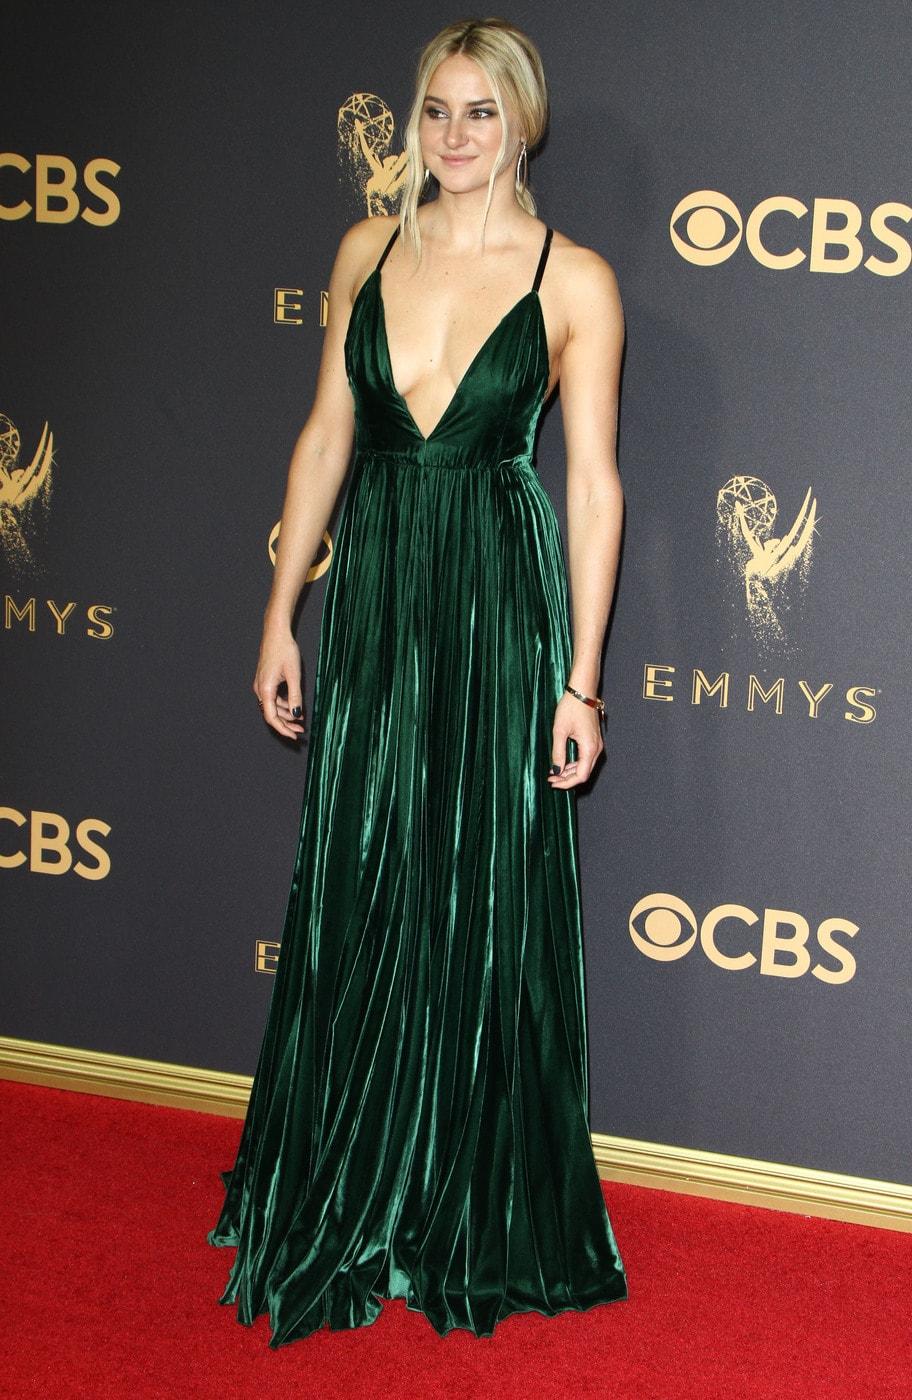 Shailene Woodley in Ralph Lauren at the 2017 Emmys